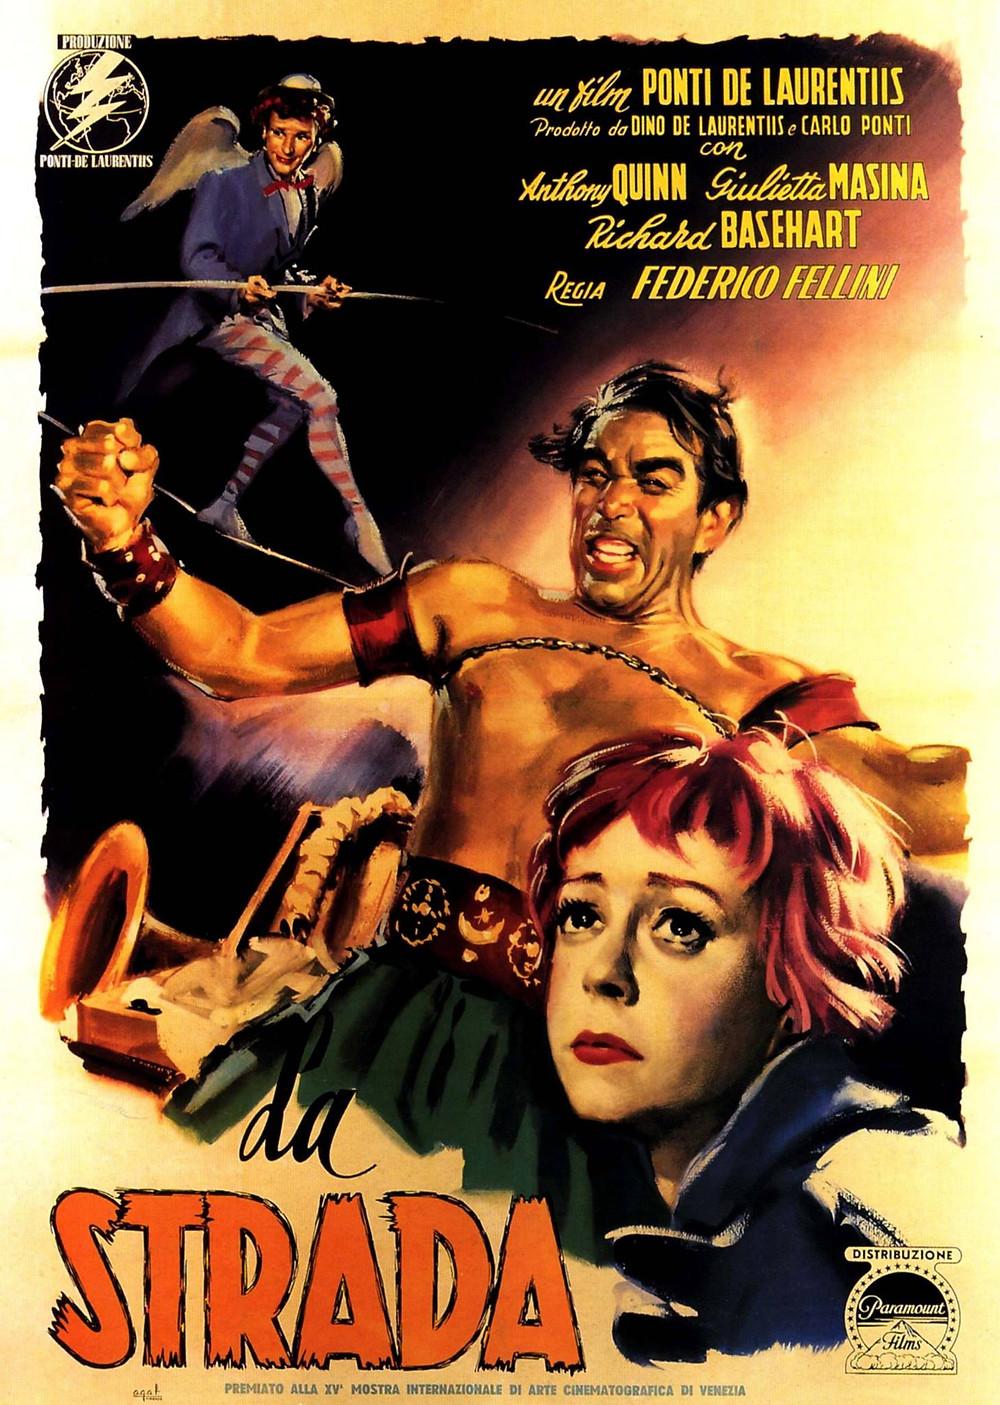 La Strada - Fellini, 1956